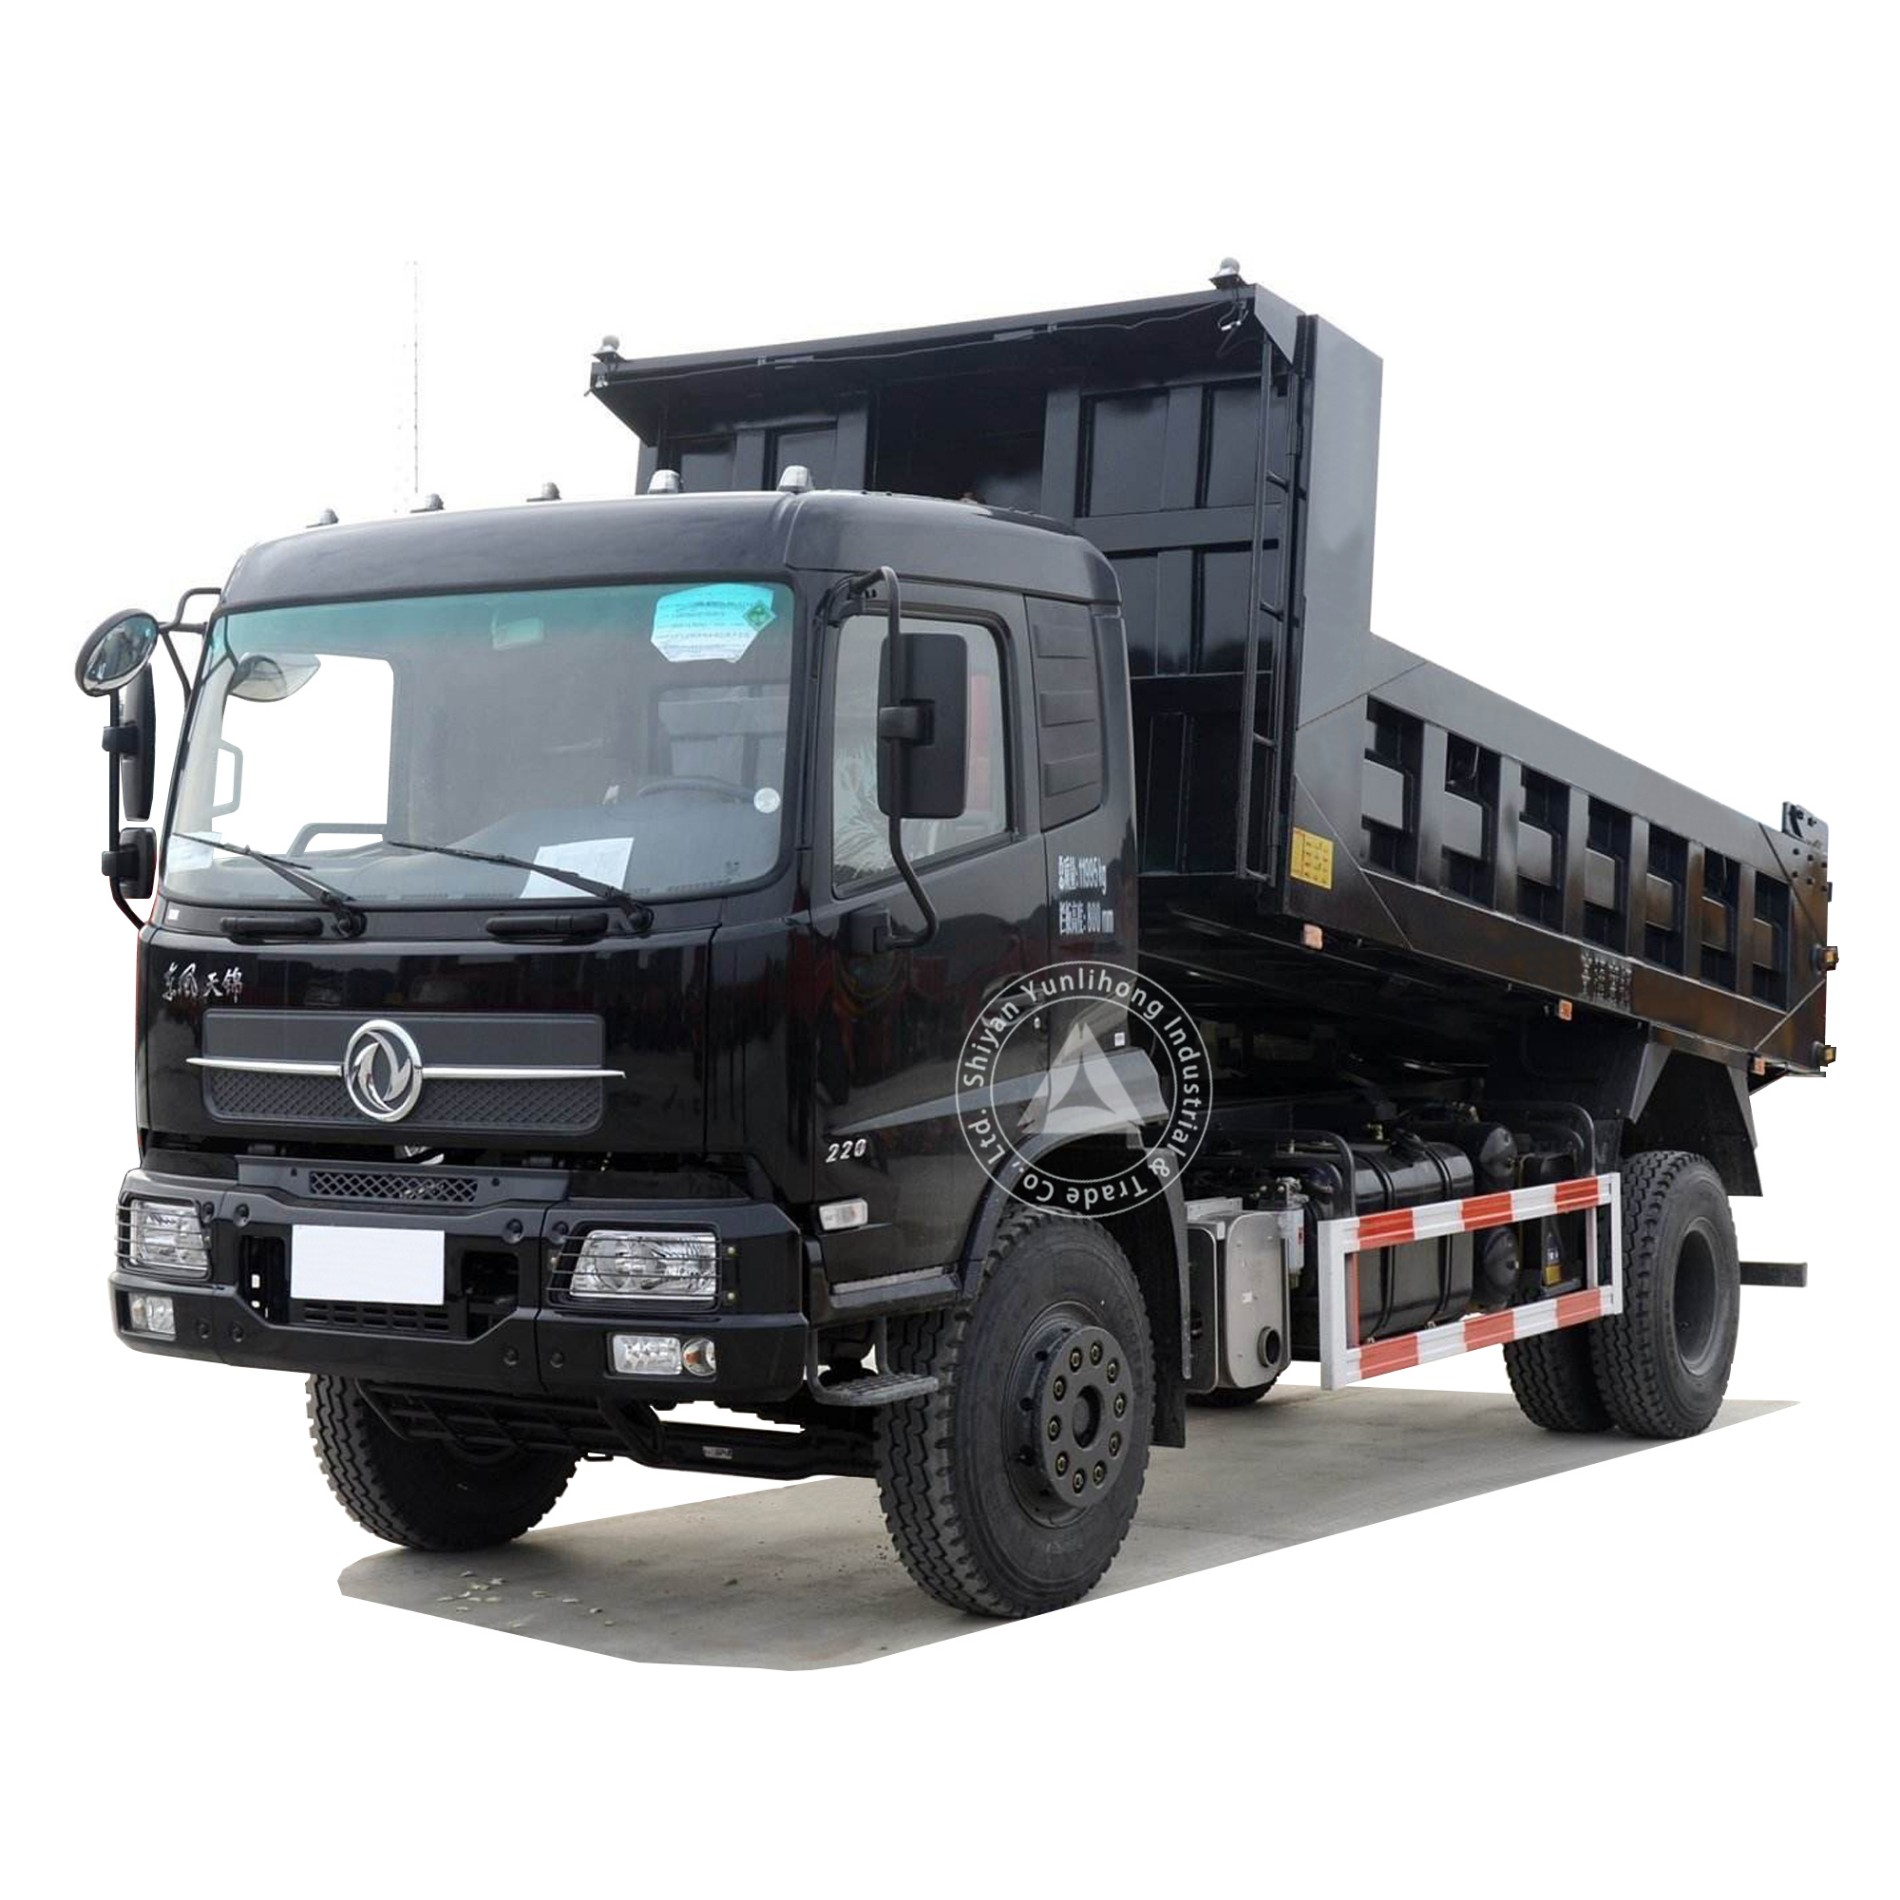 Dongfeng KR 4x2 GVW 19 Ton 7m3 To 9m3 Dump Truck